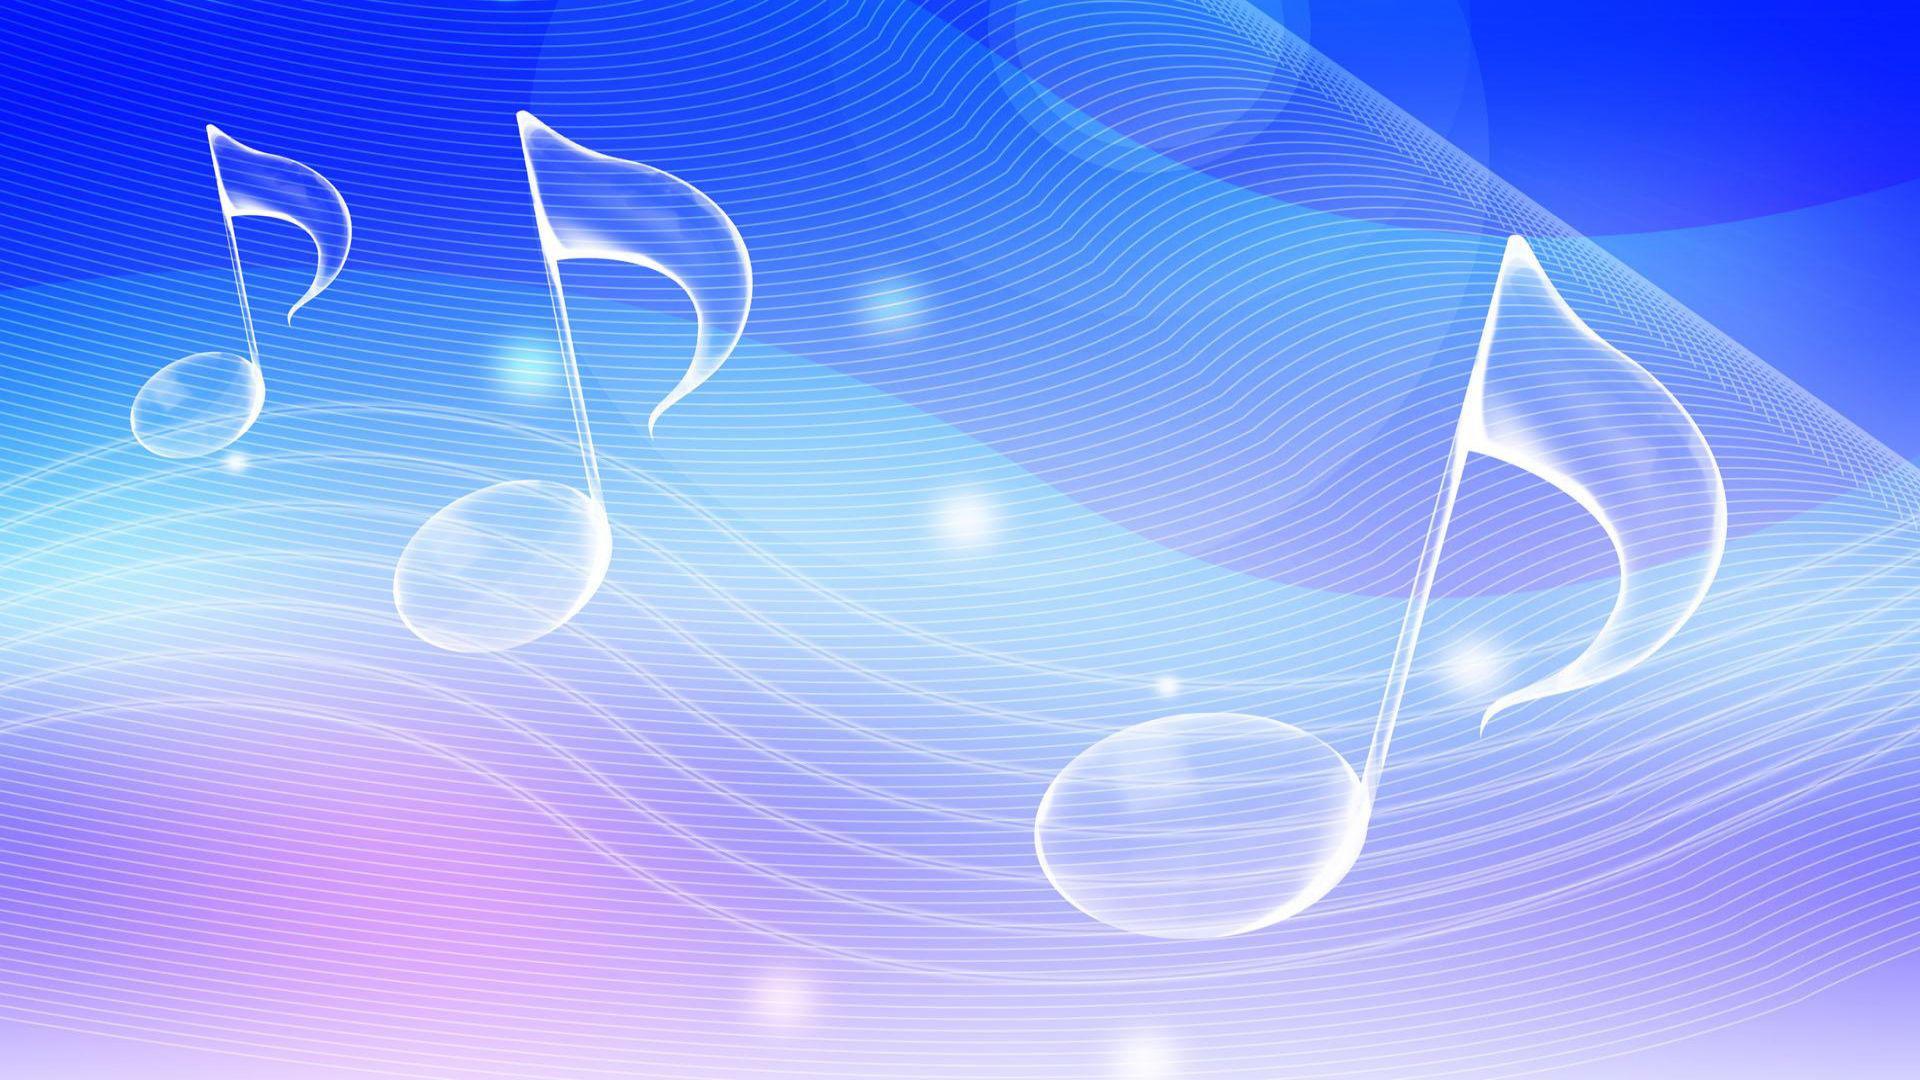 Musical notes wallpaper 7354 1920x1080